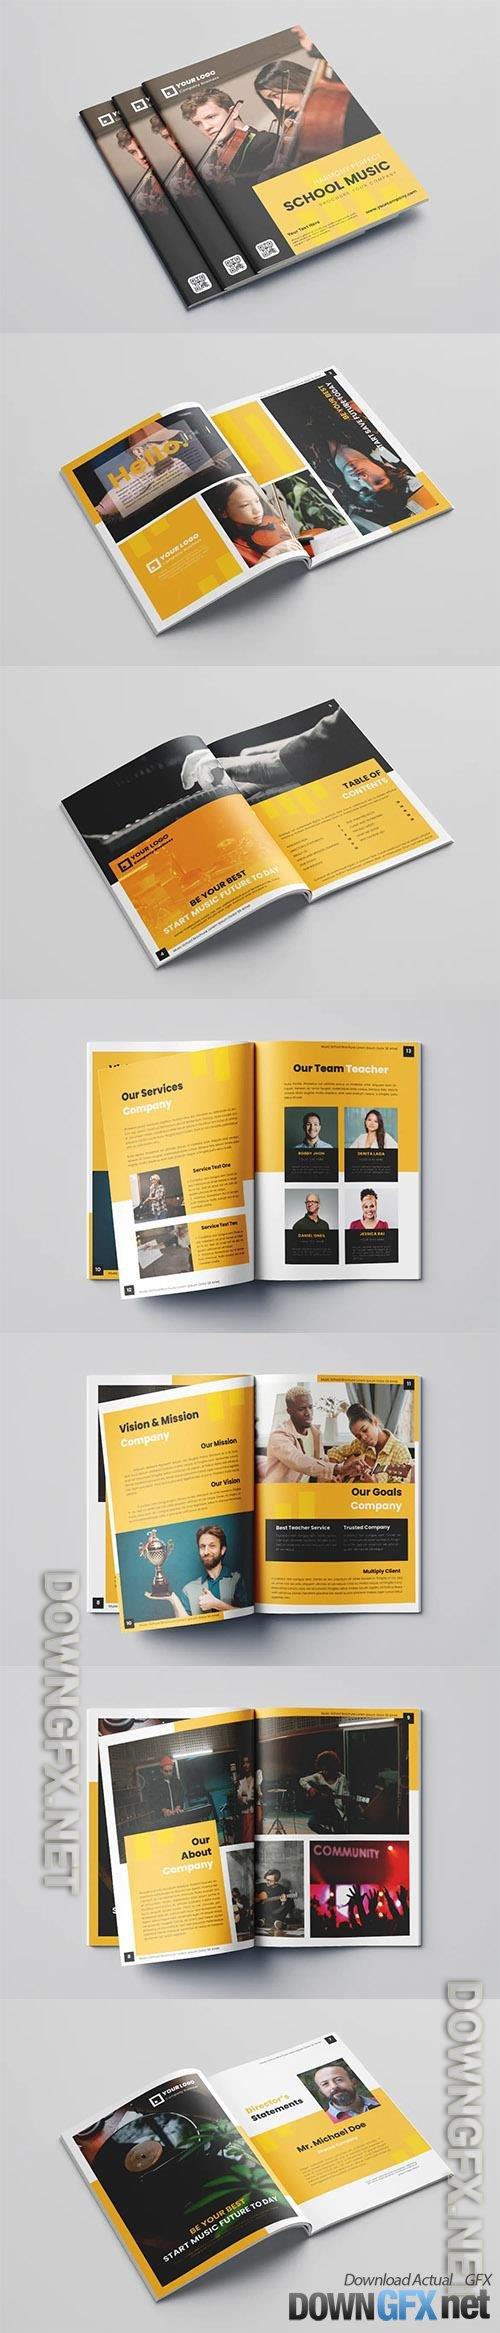 Music School Brochure Vol.1